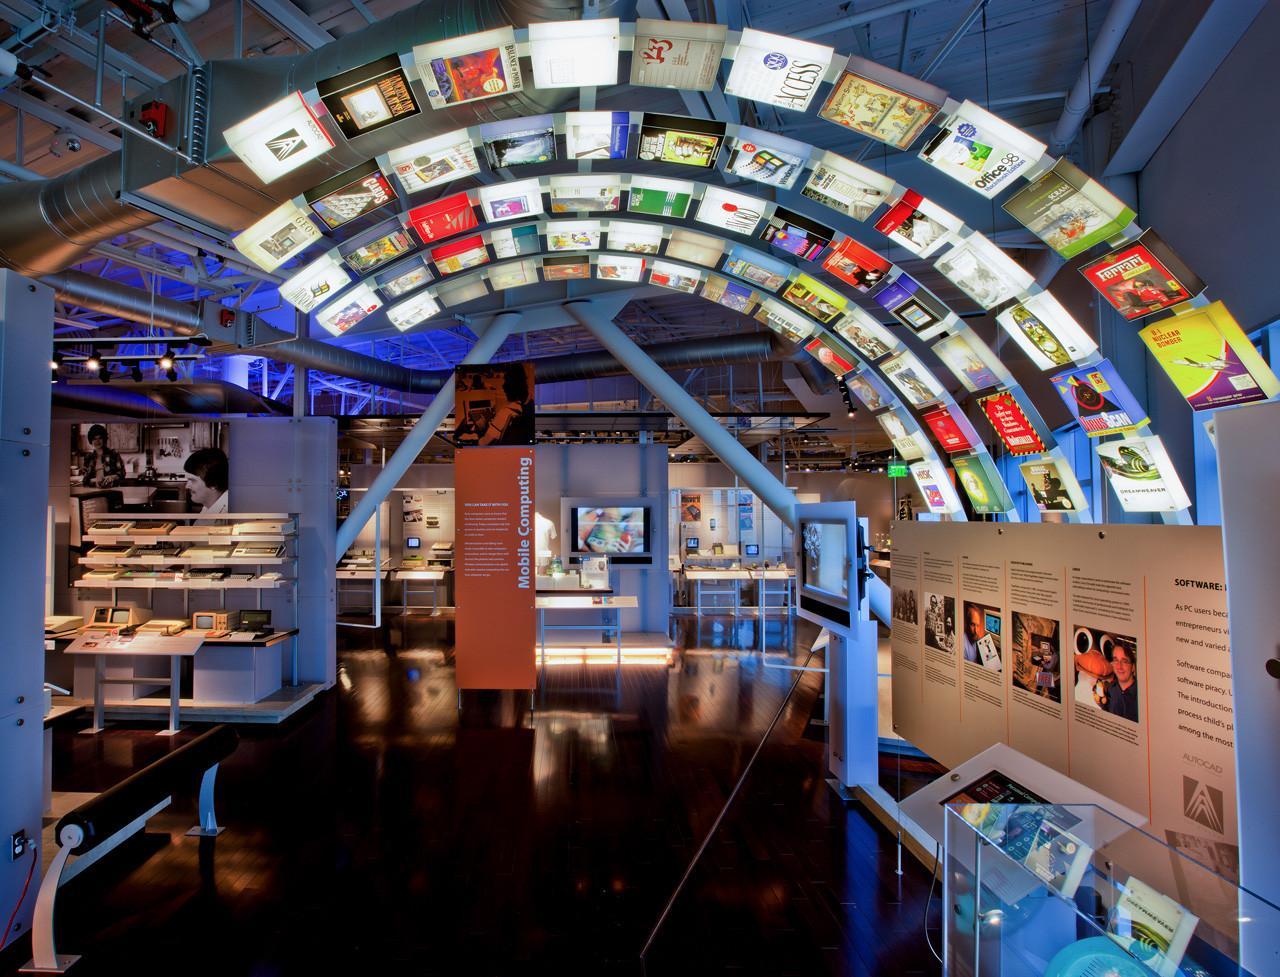 Computer History Museum / Mark Horton / Architecture, © Mark Richards